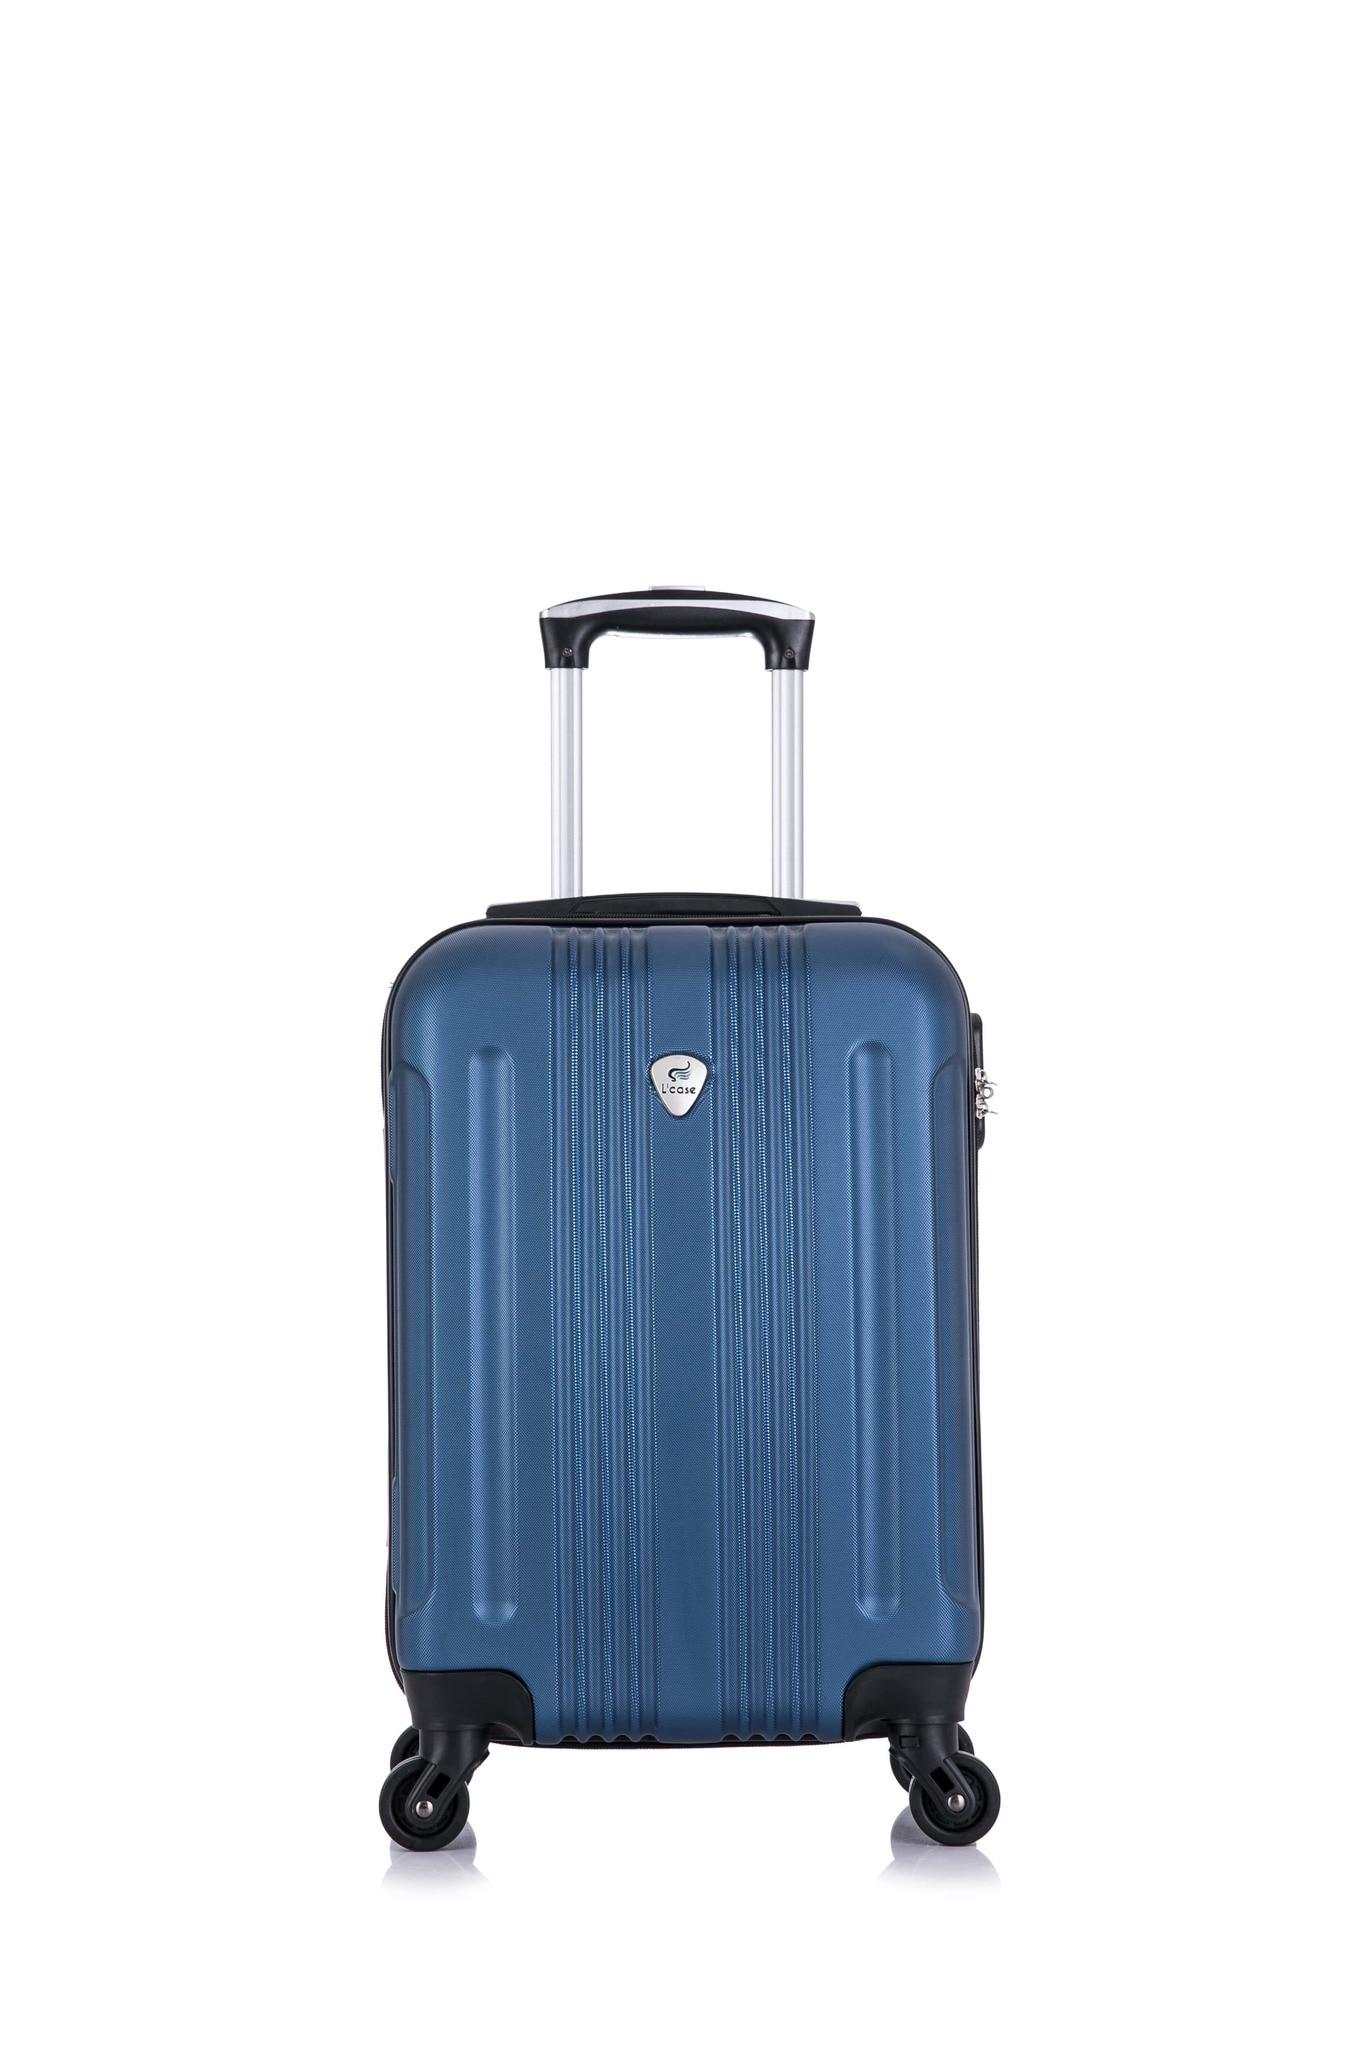 Lcase Темно-синий чемодан Bangkok